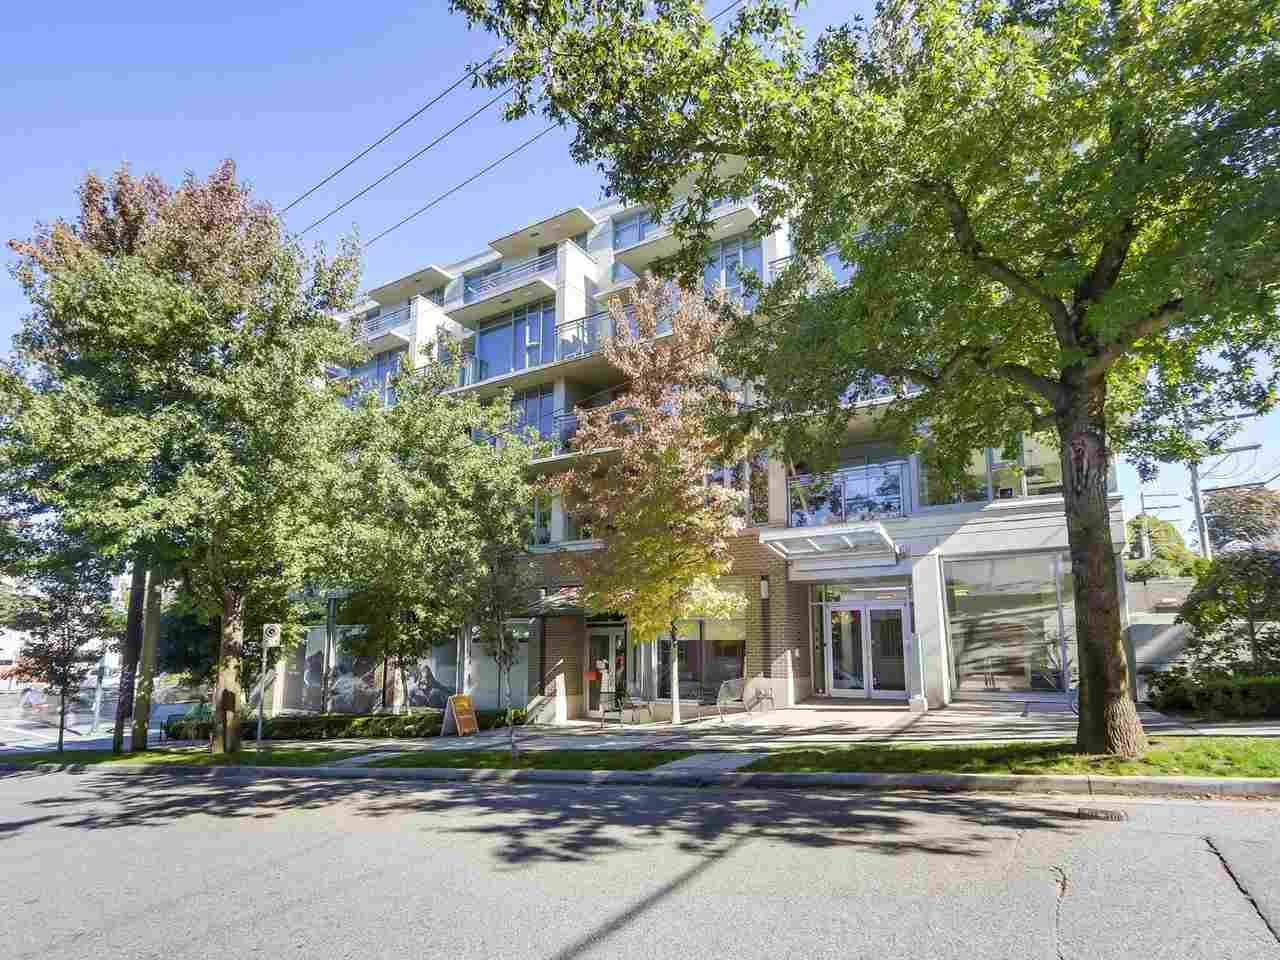 Sold: 412 - 2520 Manitoba Street, Vancouver, BC